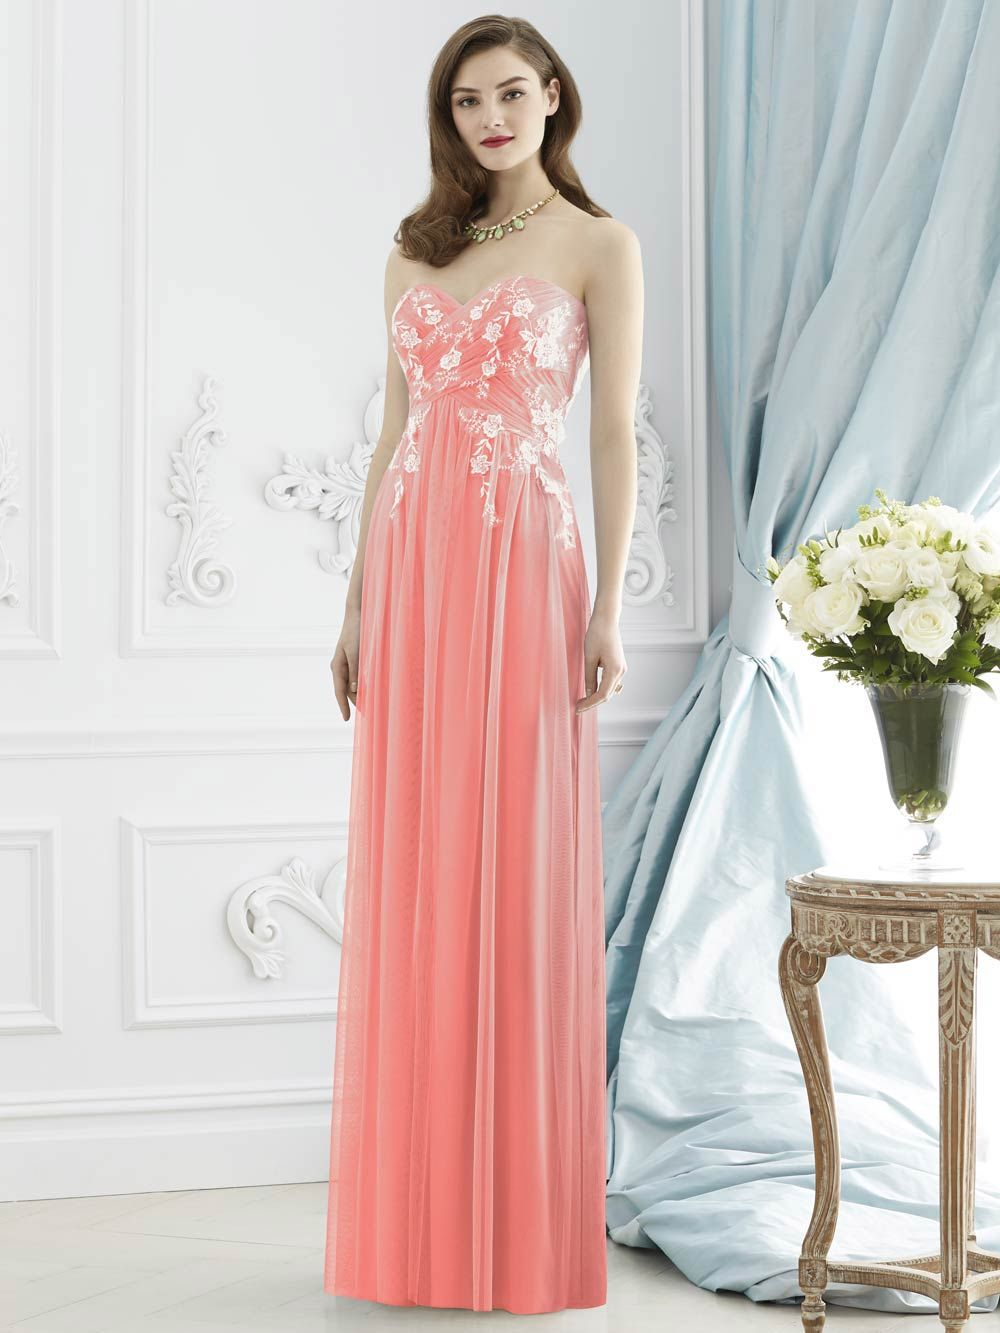 Stylish Orange Bridesmaid Dresses: Our Top Picks | Wedding planning ...